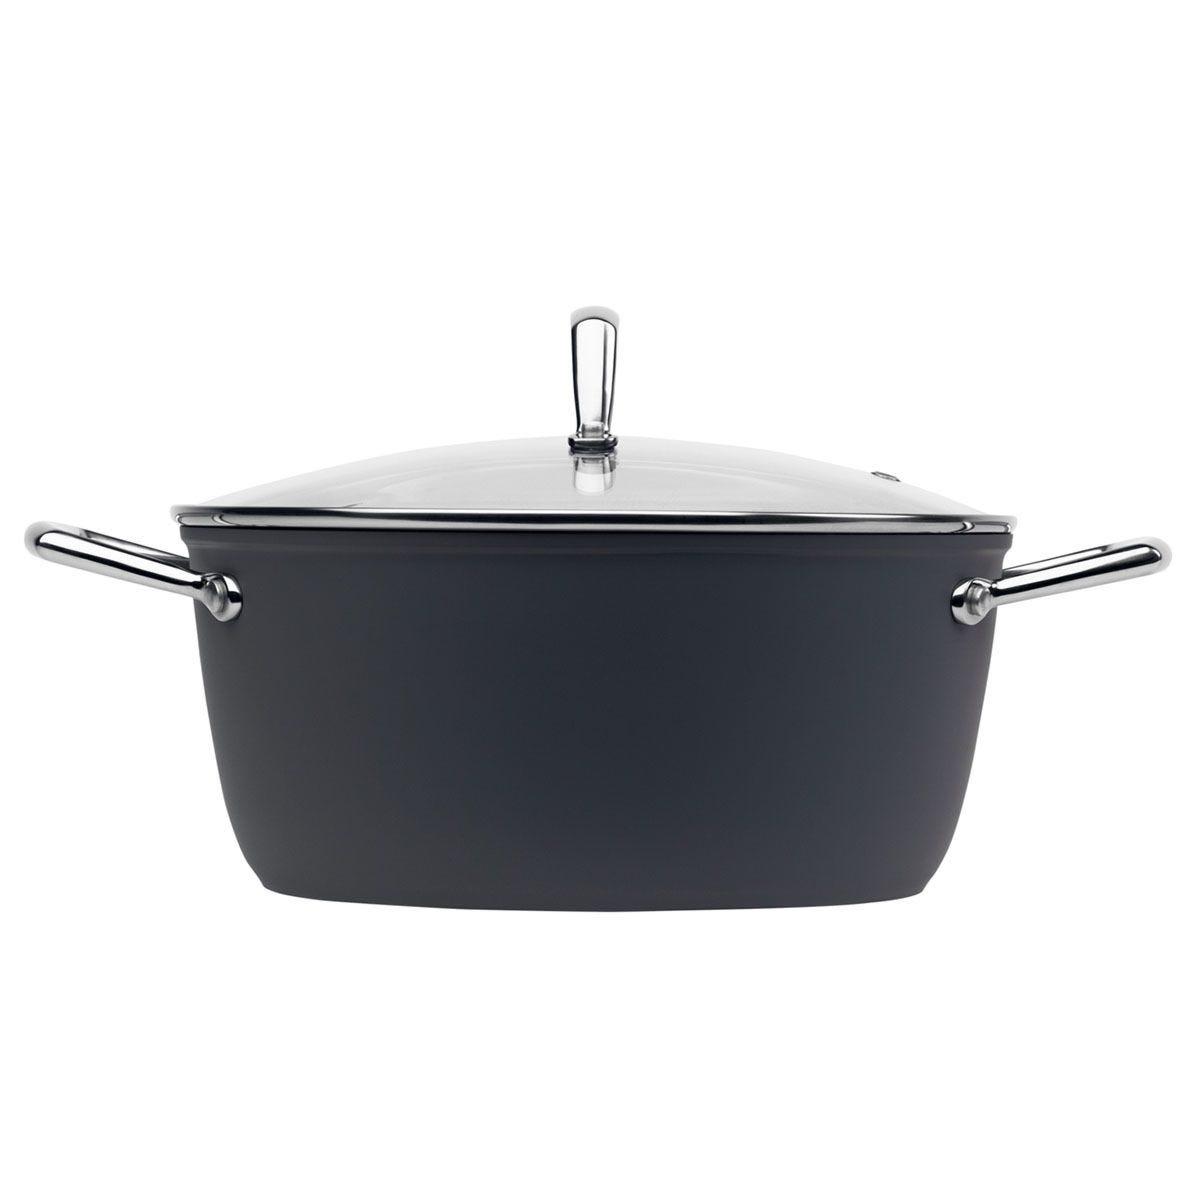 Haden Perth Sleek 24cm Casserole Pot - Grey